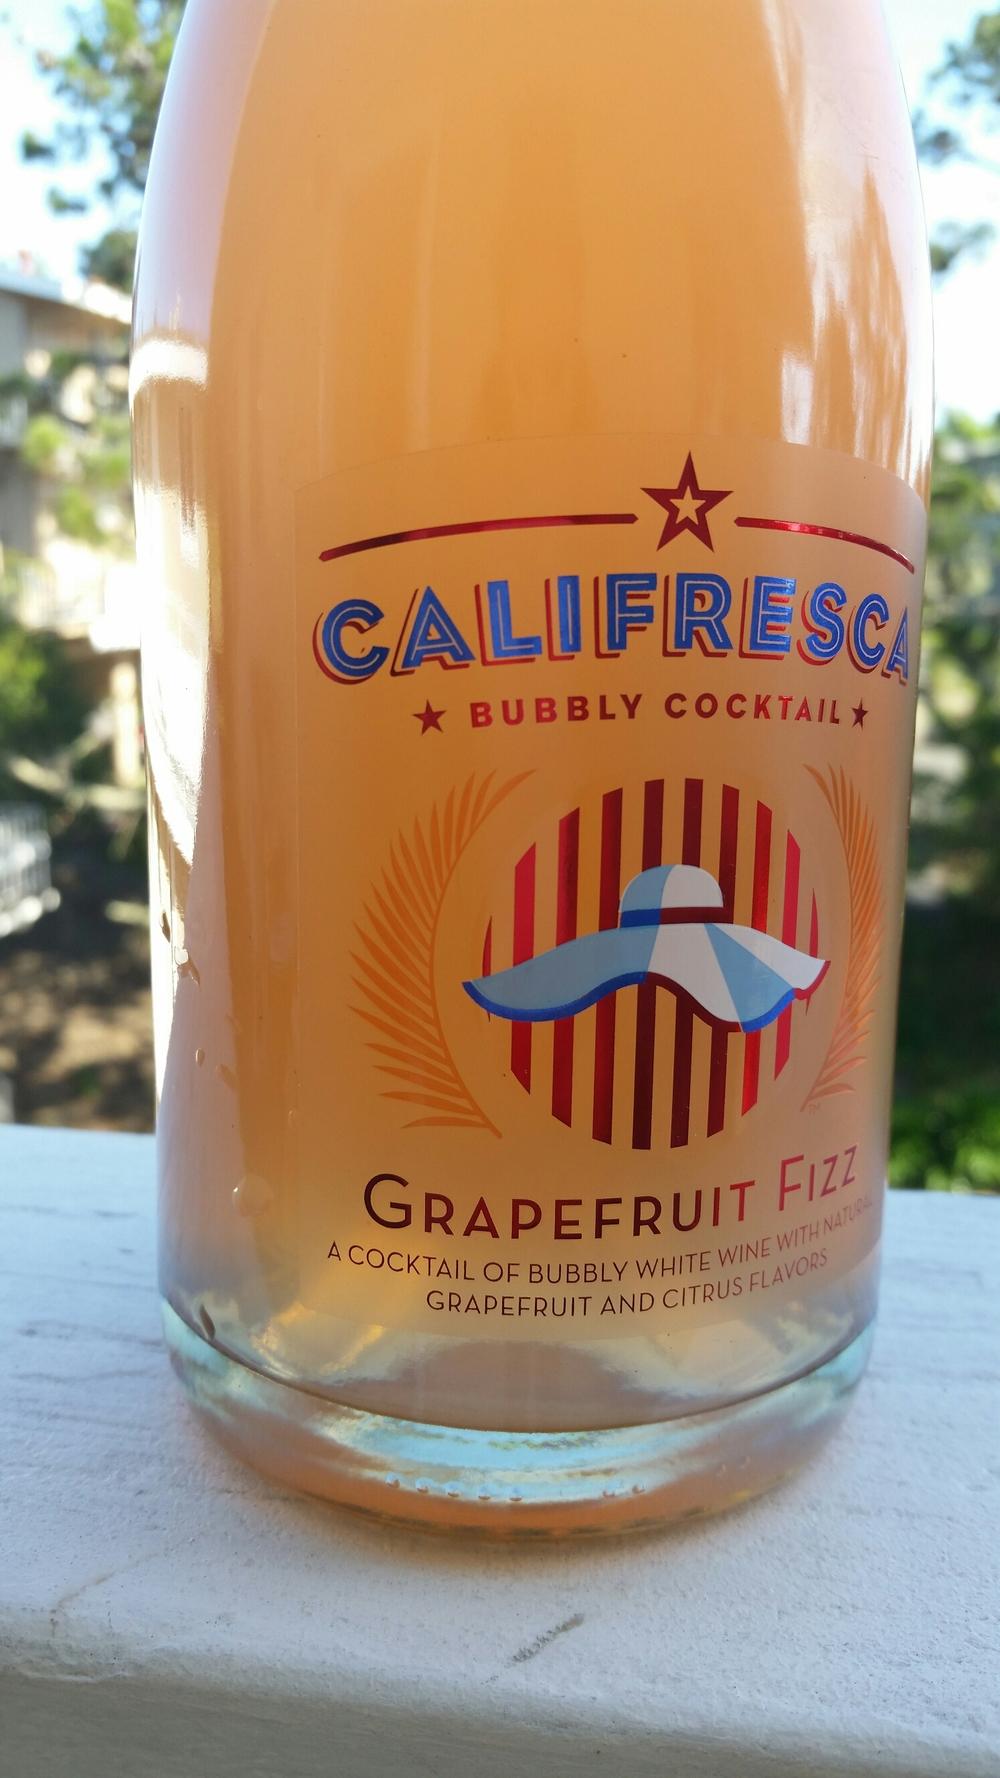 Wine review by LT - Grapefruit Fizz